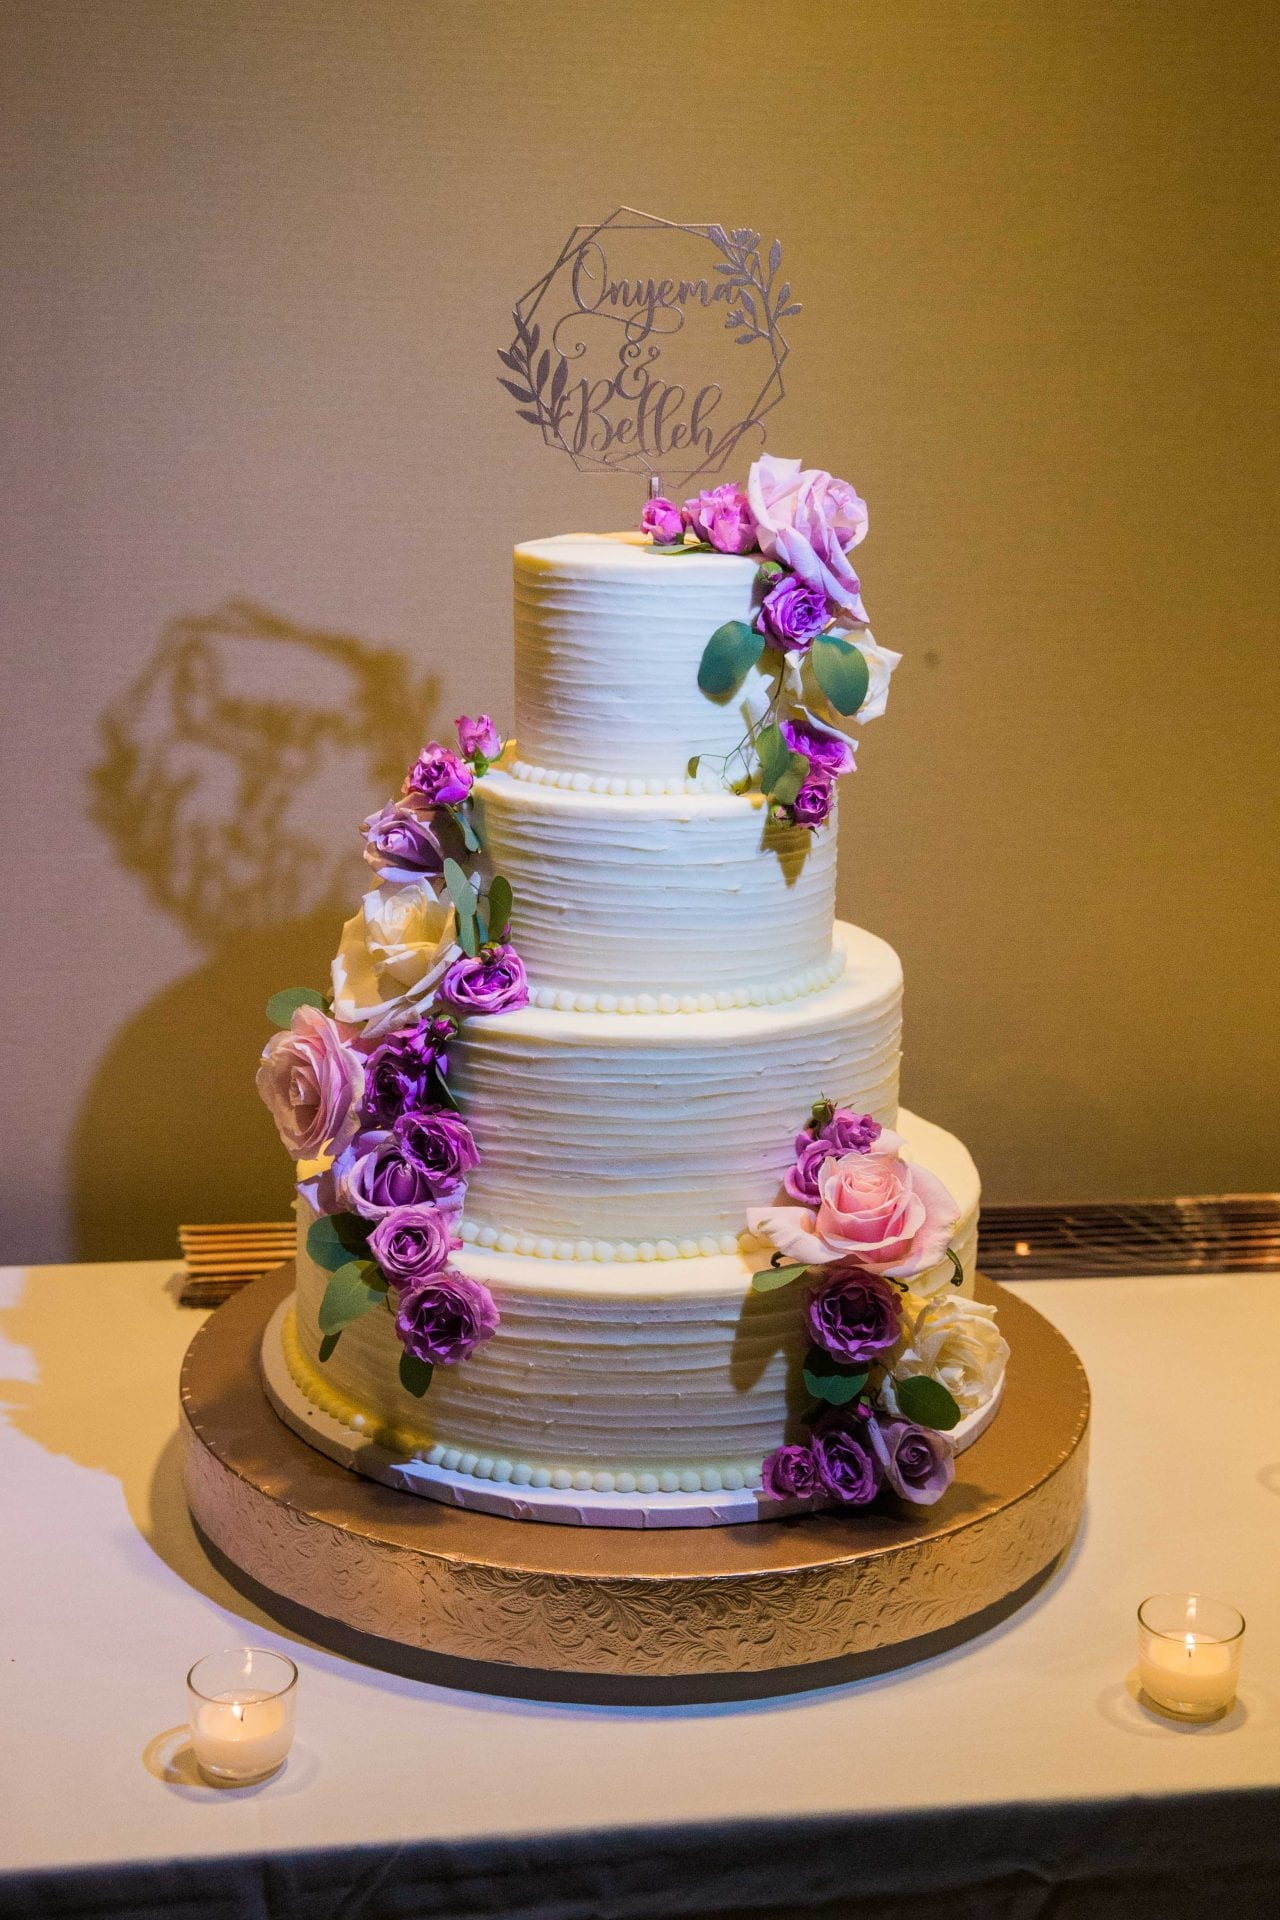 Onyema wedding La Cantera cake